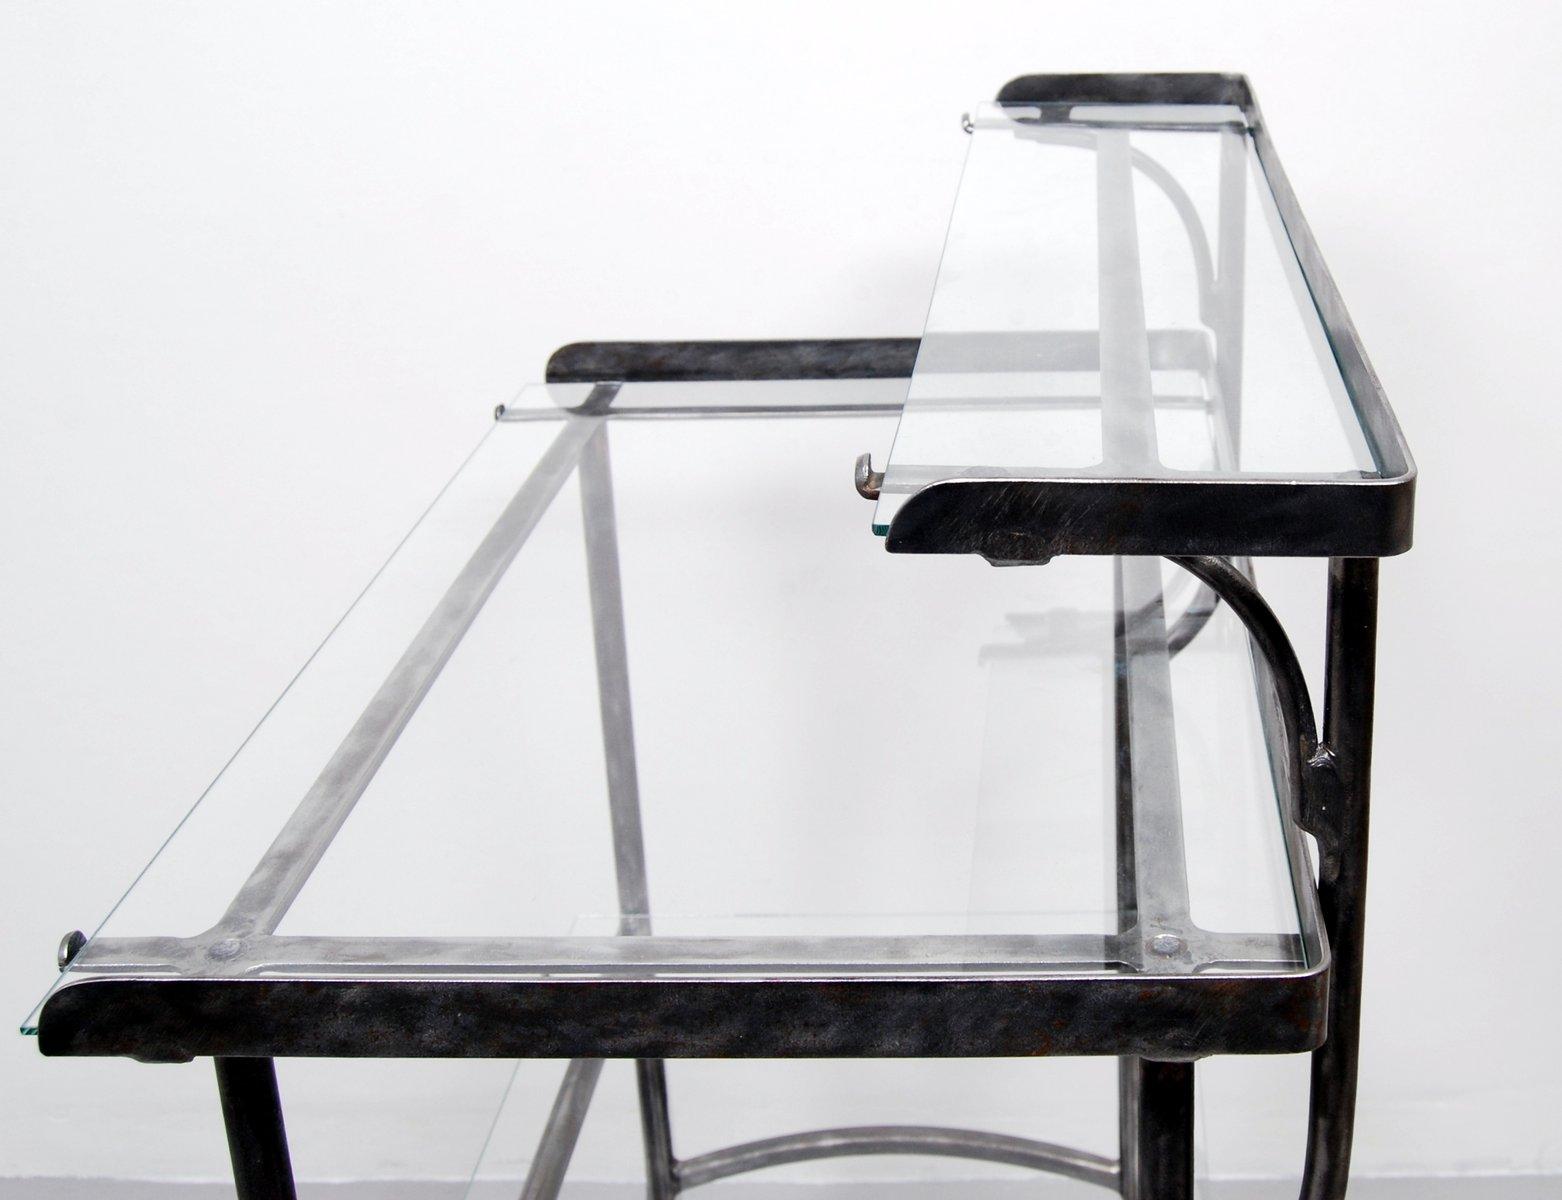 Antique Metal Dental Cabinet Vintage Swedish Dentist Trolley In Brushed Steel From Kifa For